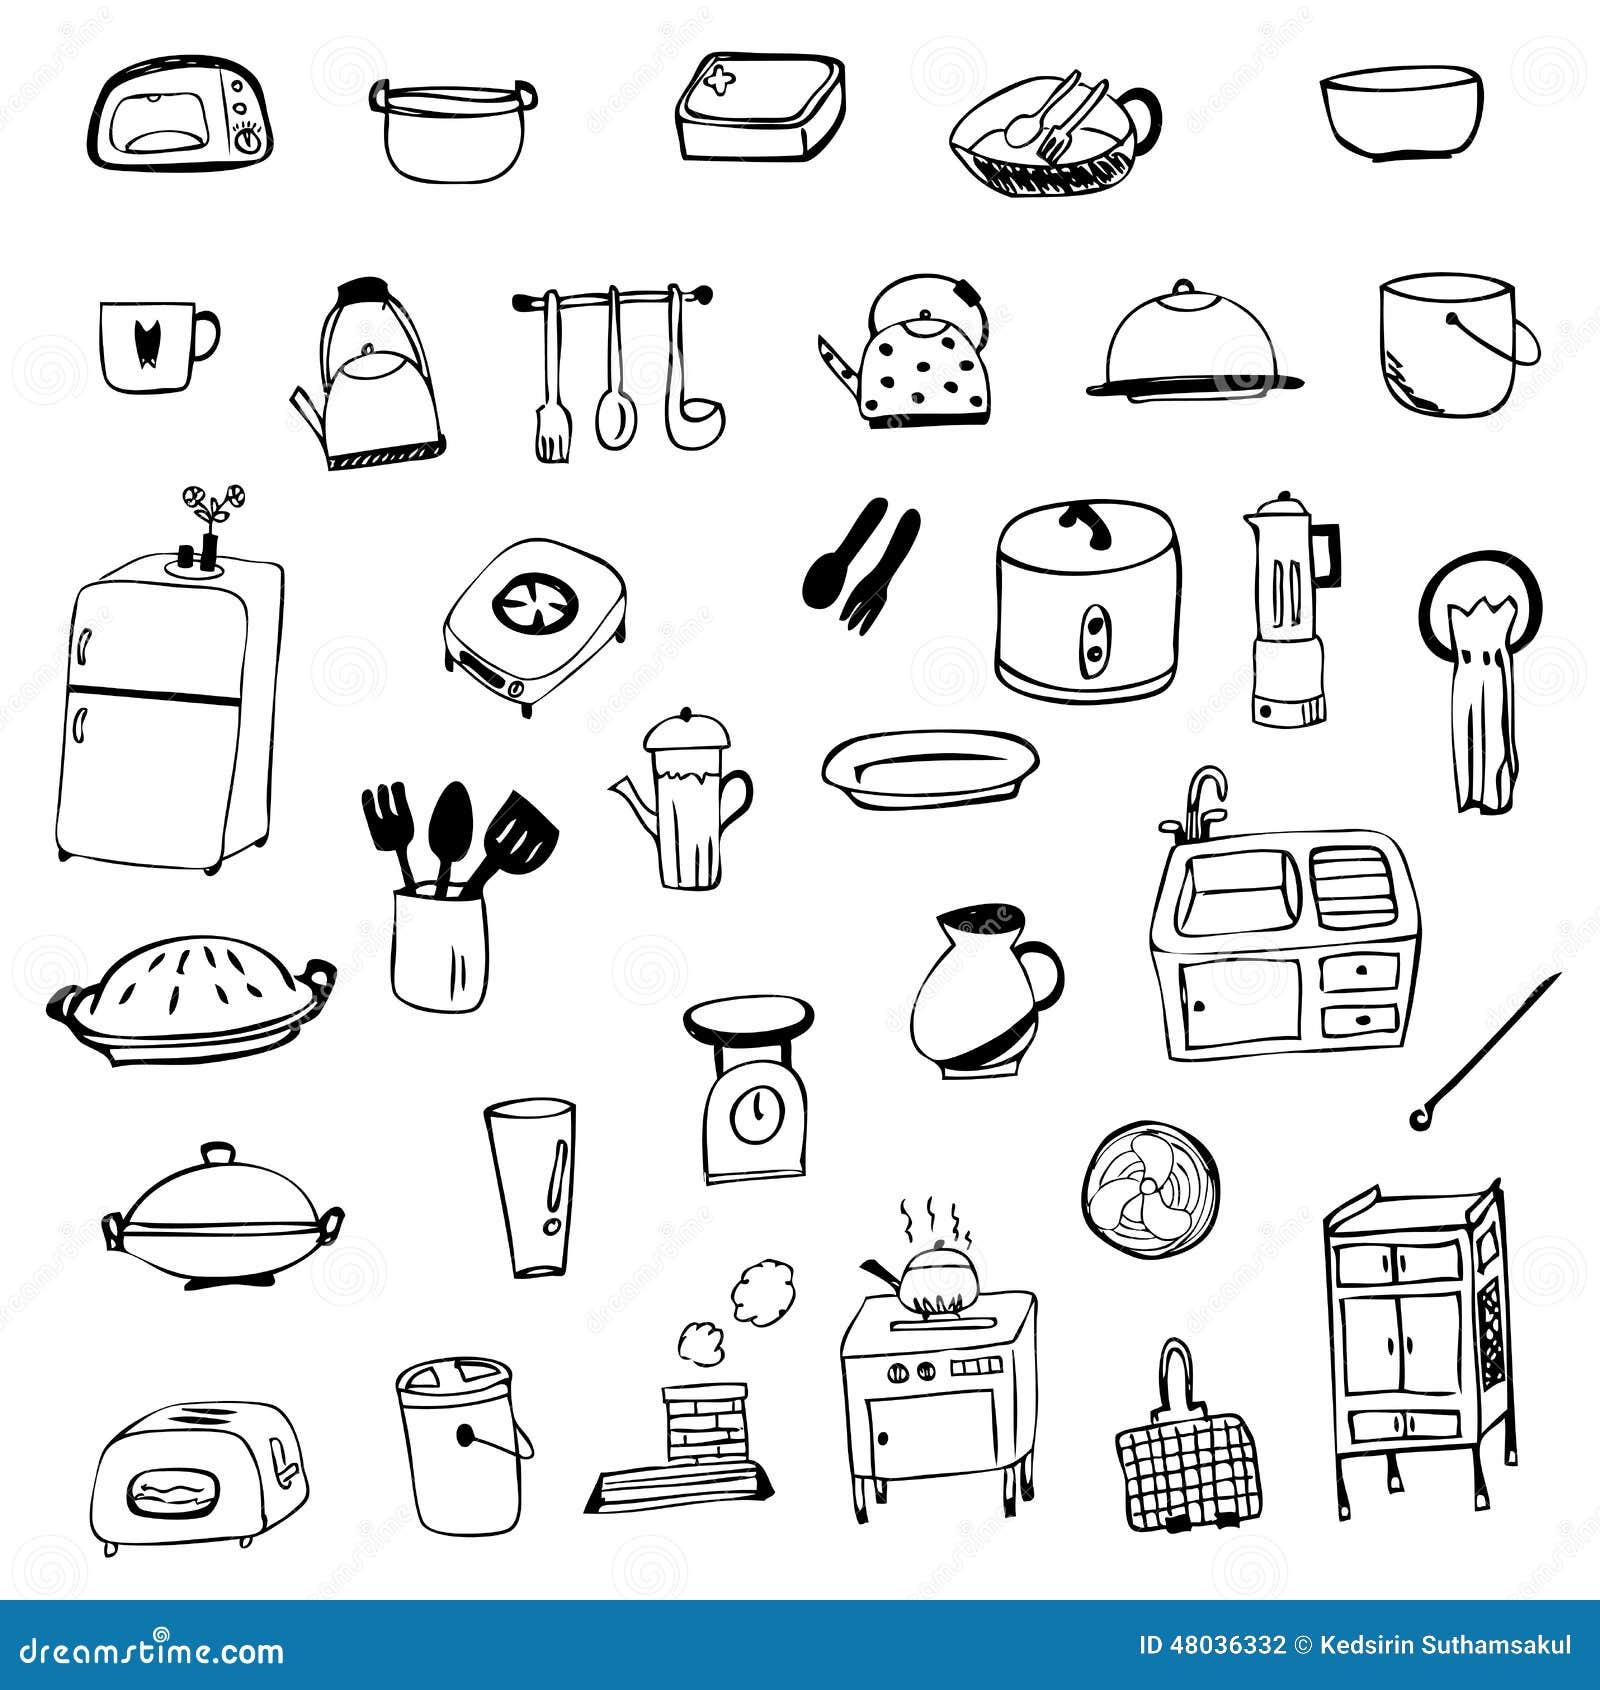 Equipement de cuisine best petit quipement de cuisine for Equipement de cuisine commerciale